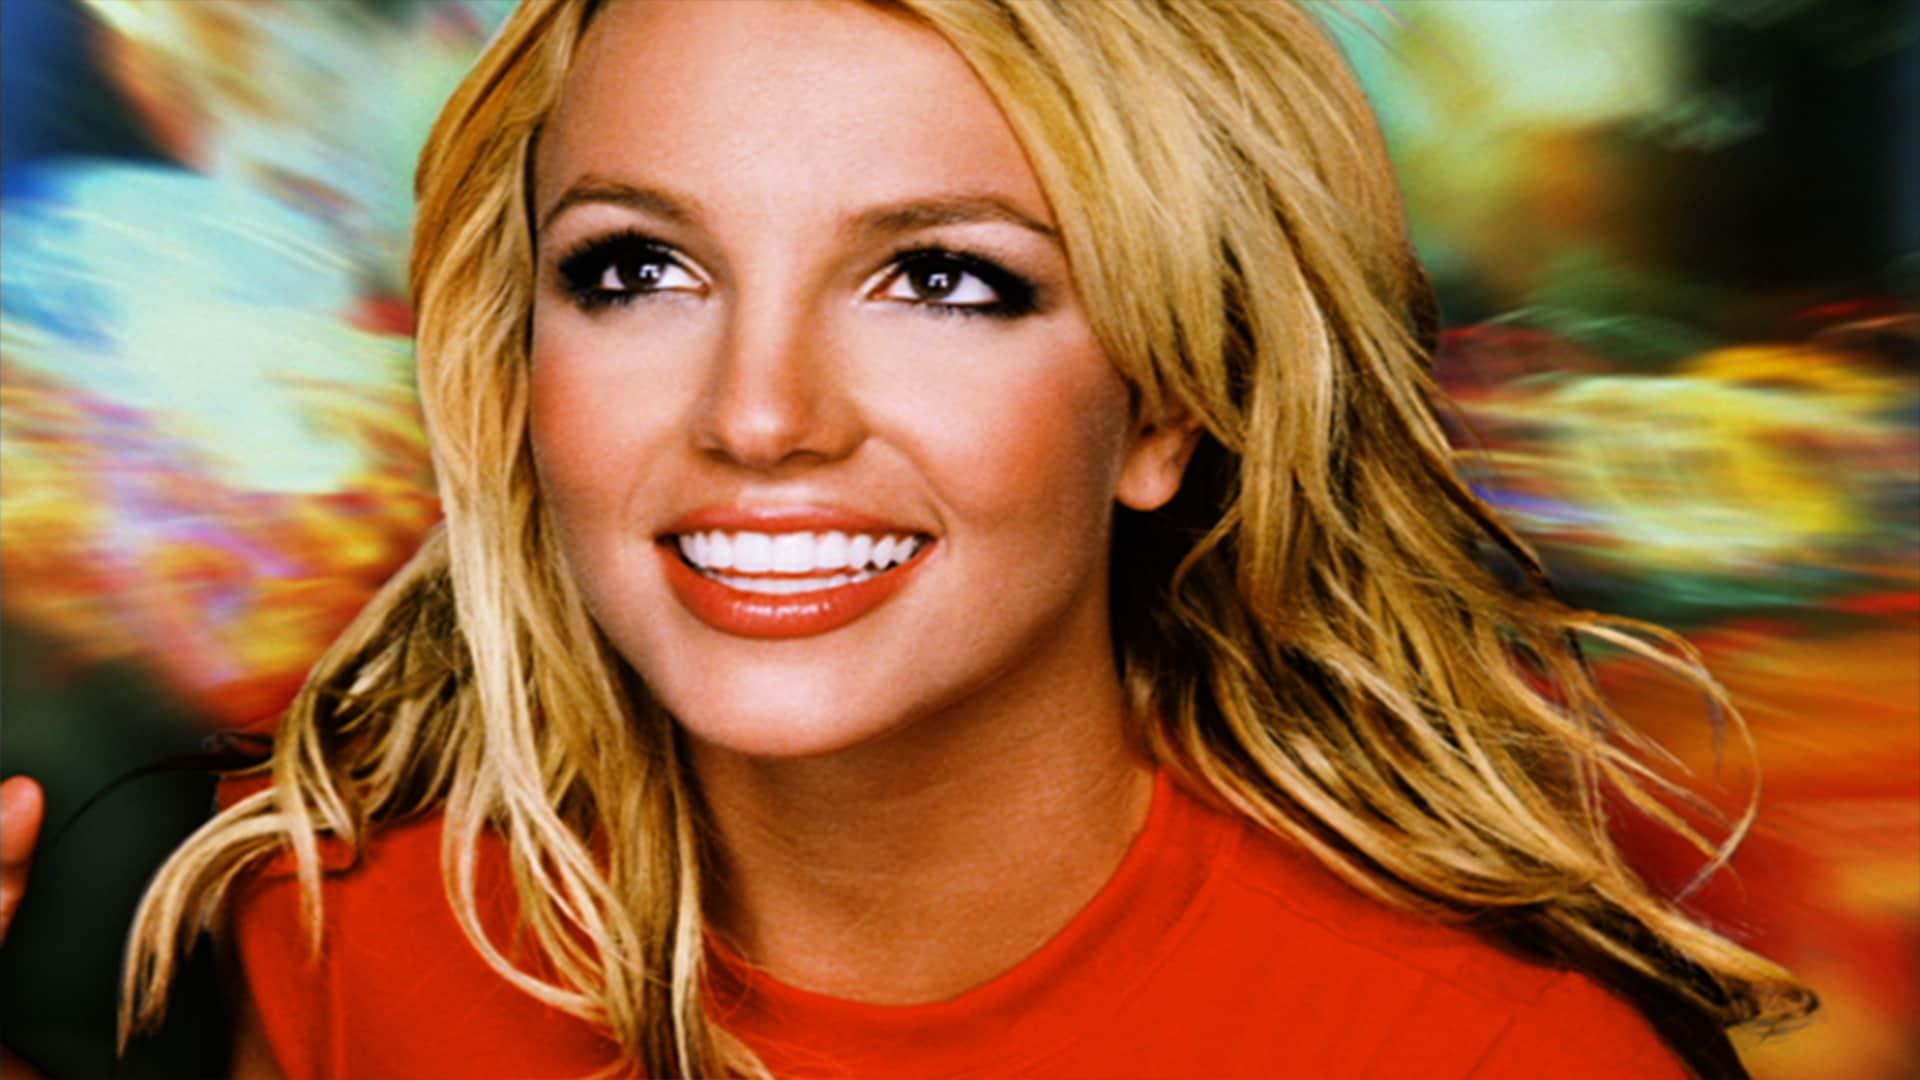 Britney Spears: February 2, 2002